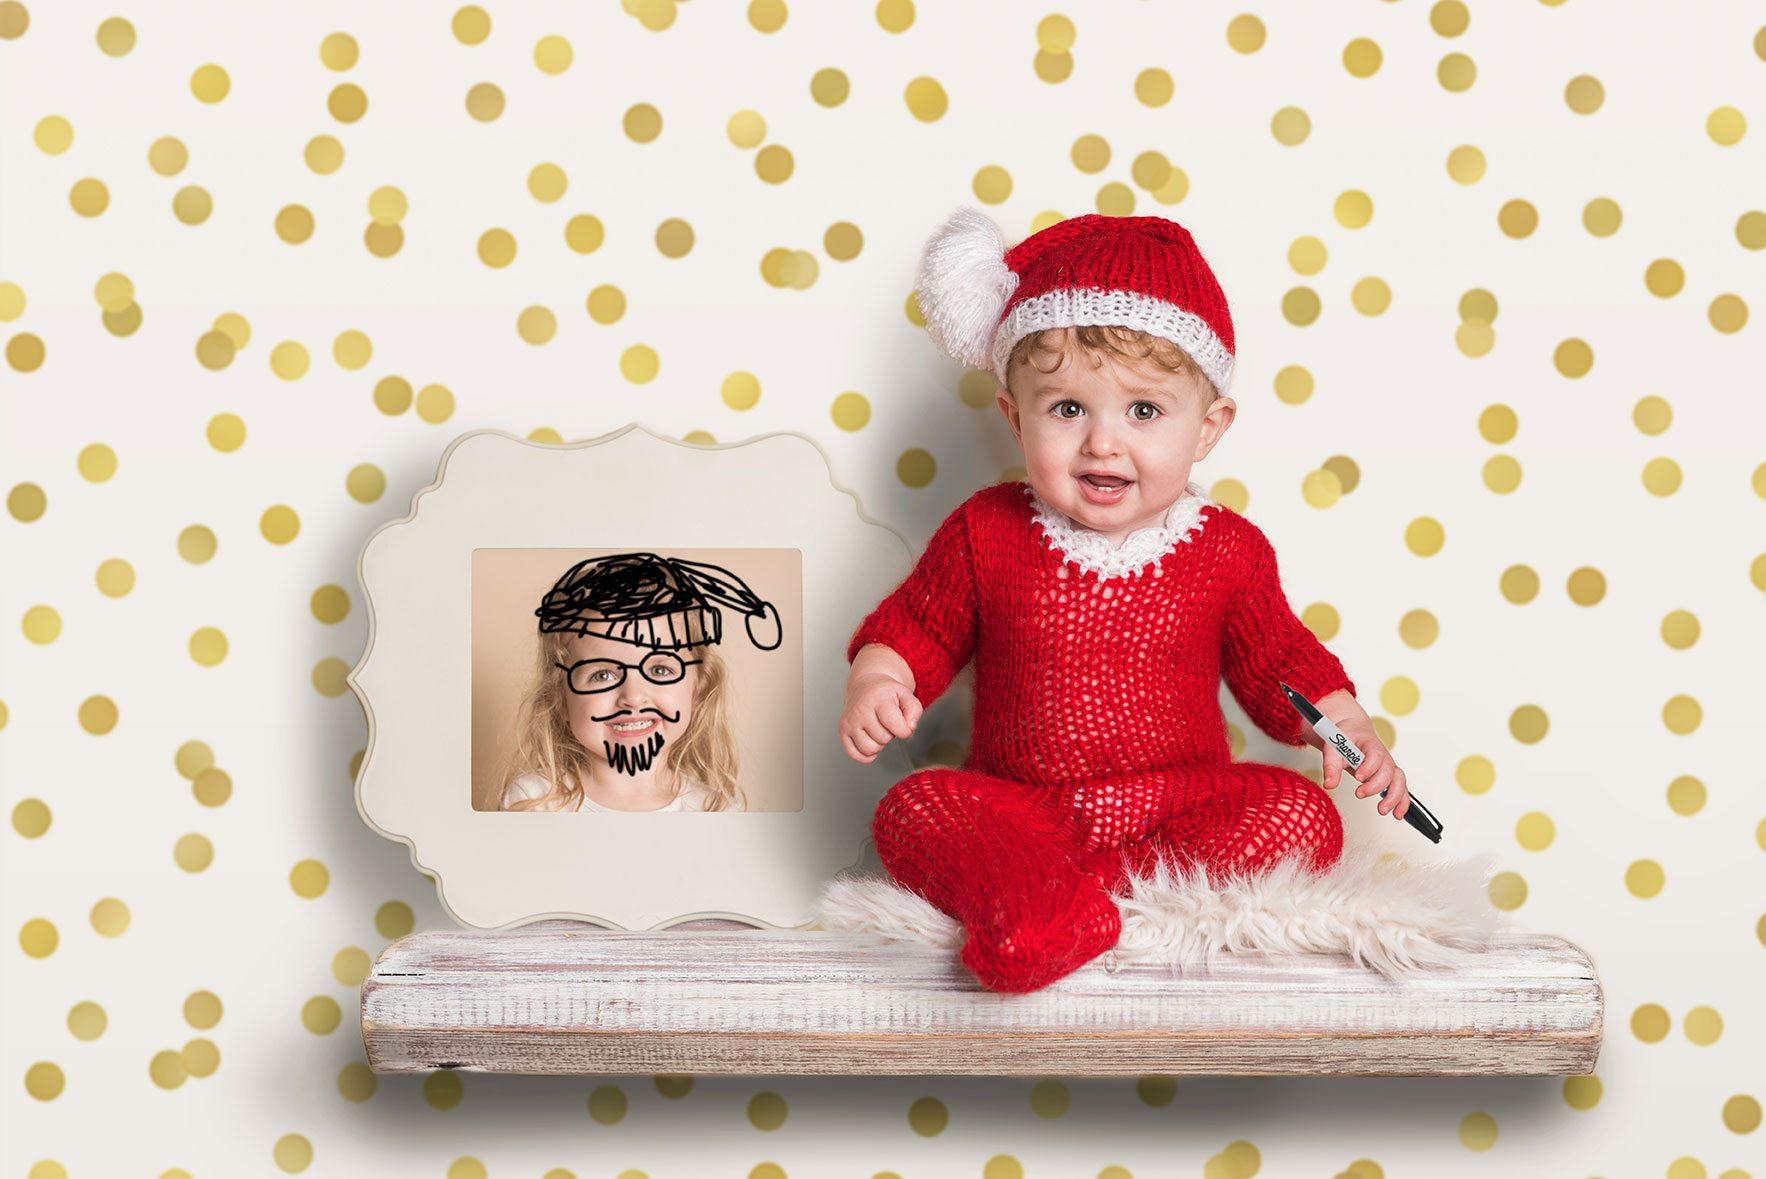 Essex baby photographer - Christmas mini session photoshoots.